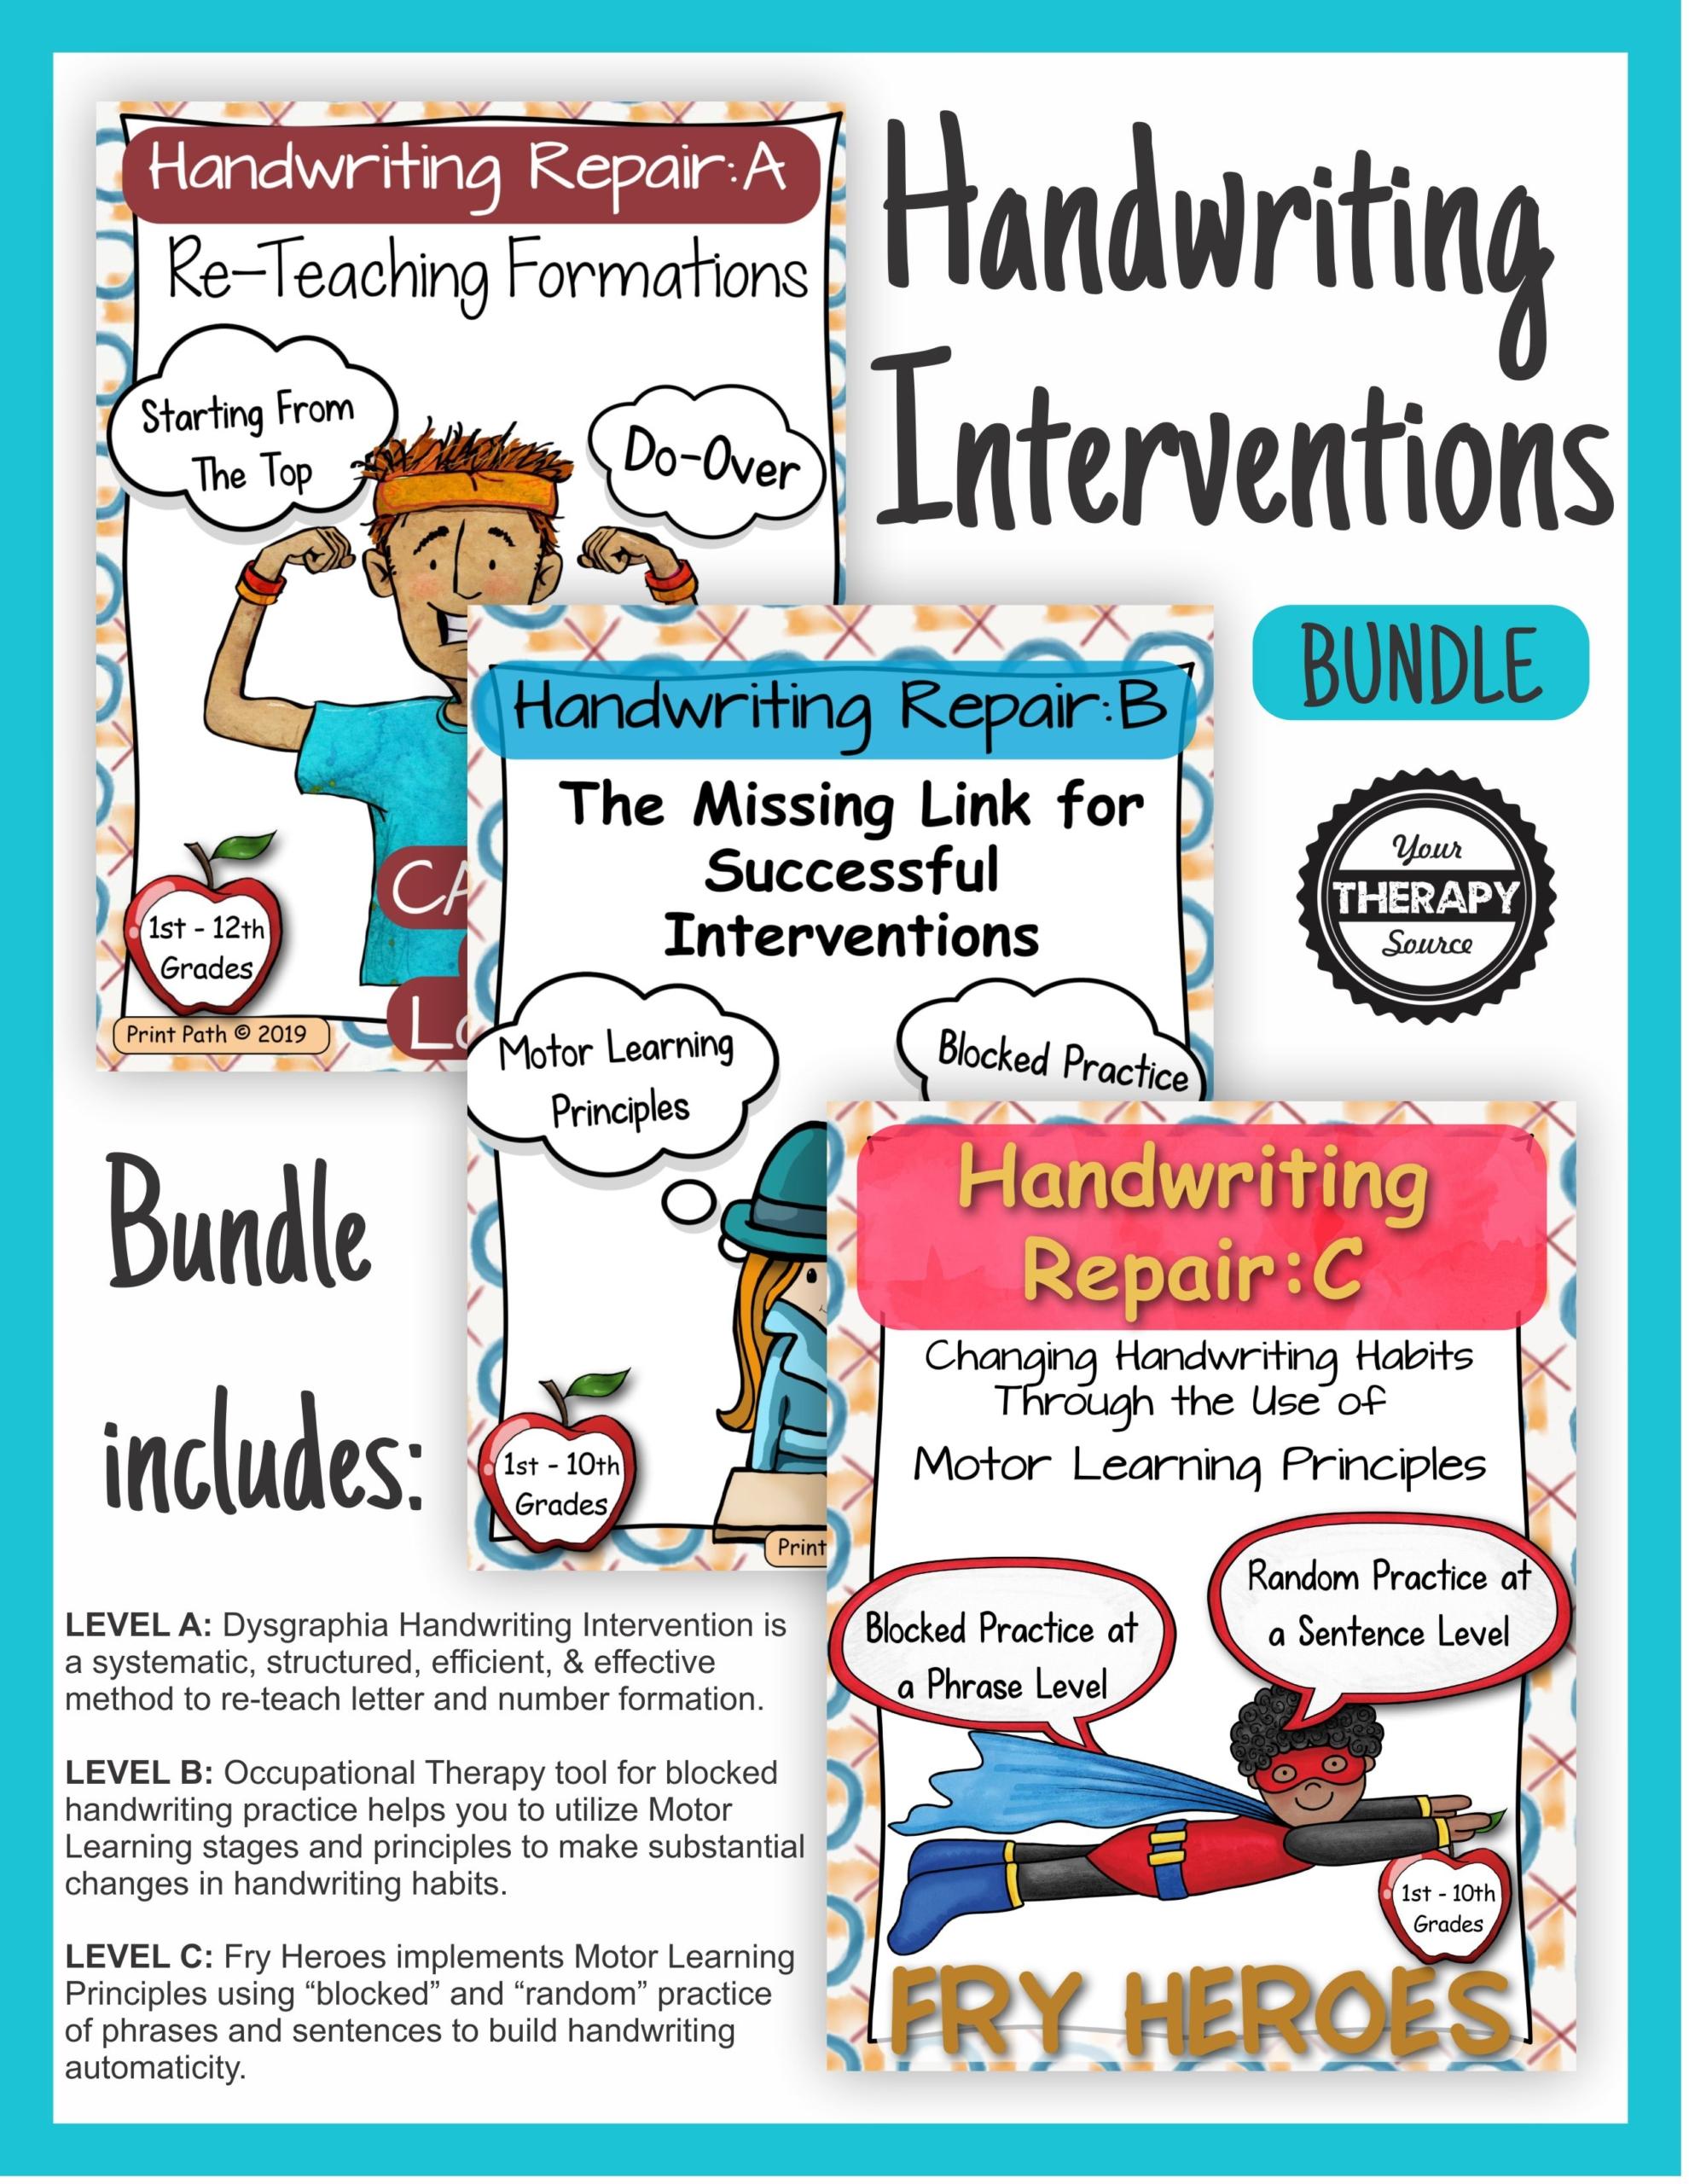 Handwriting Interventions Bundle